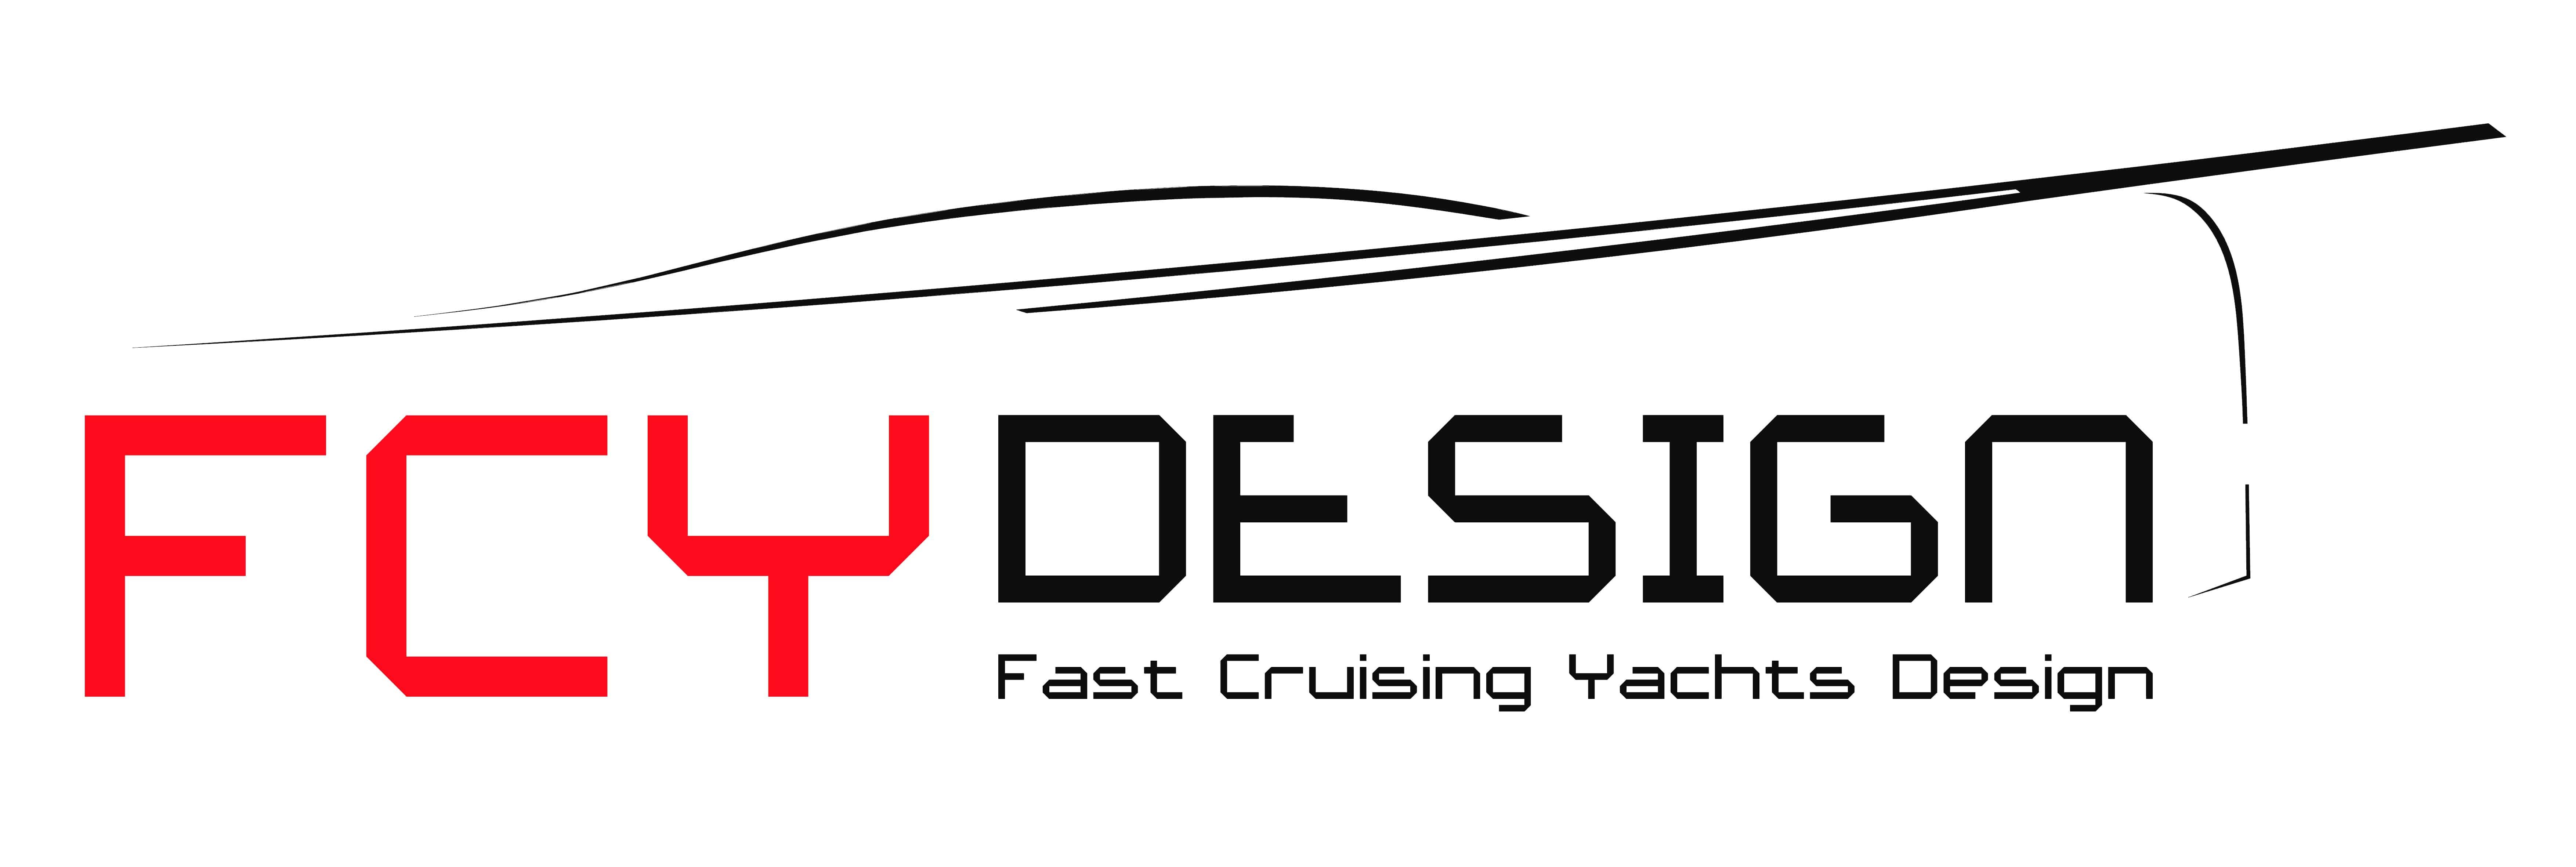 FCY Design